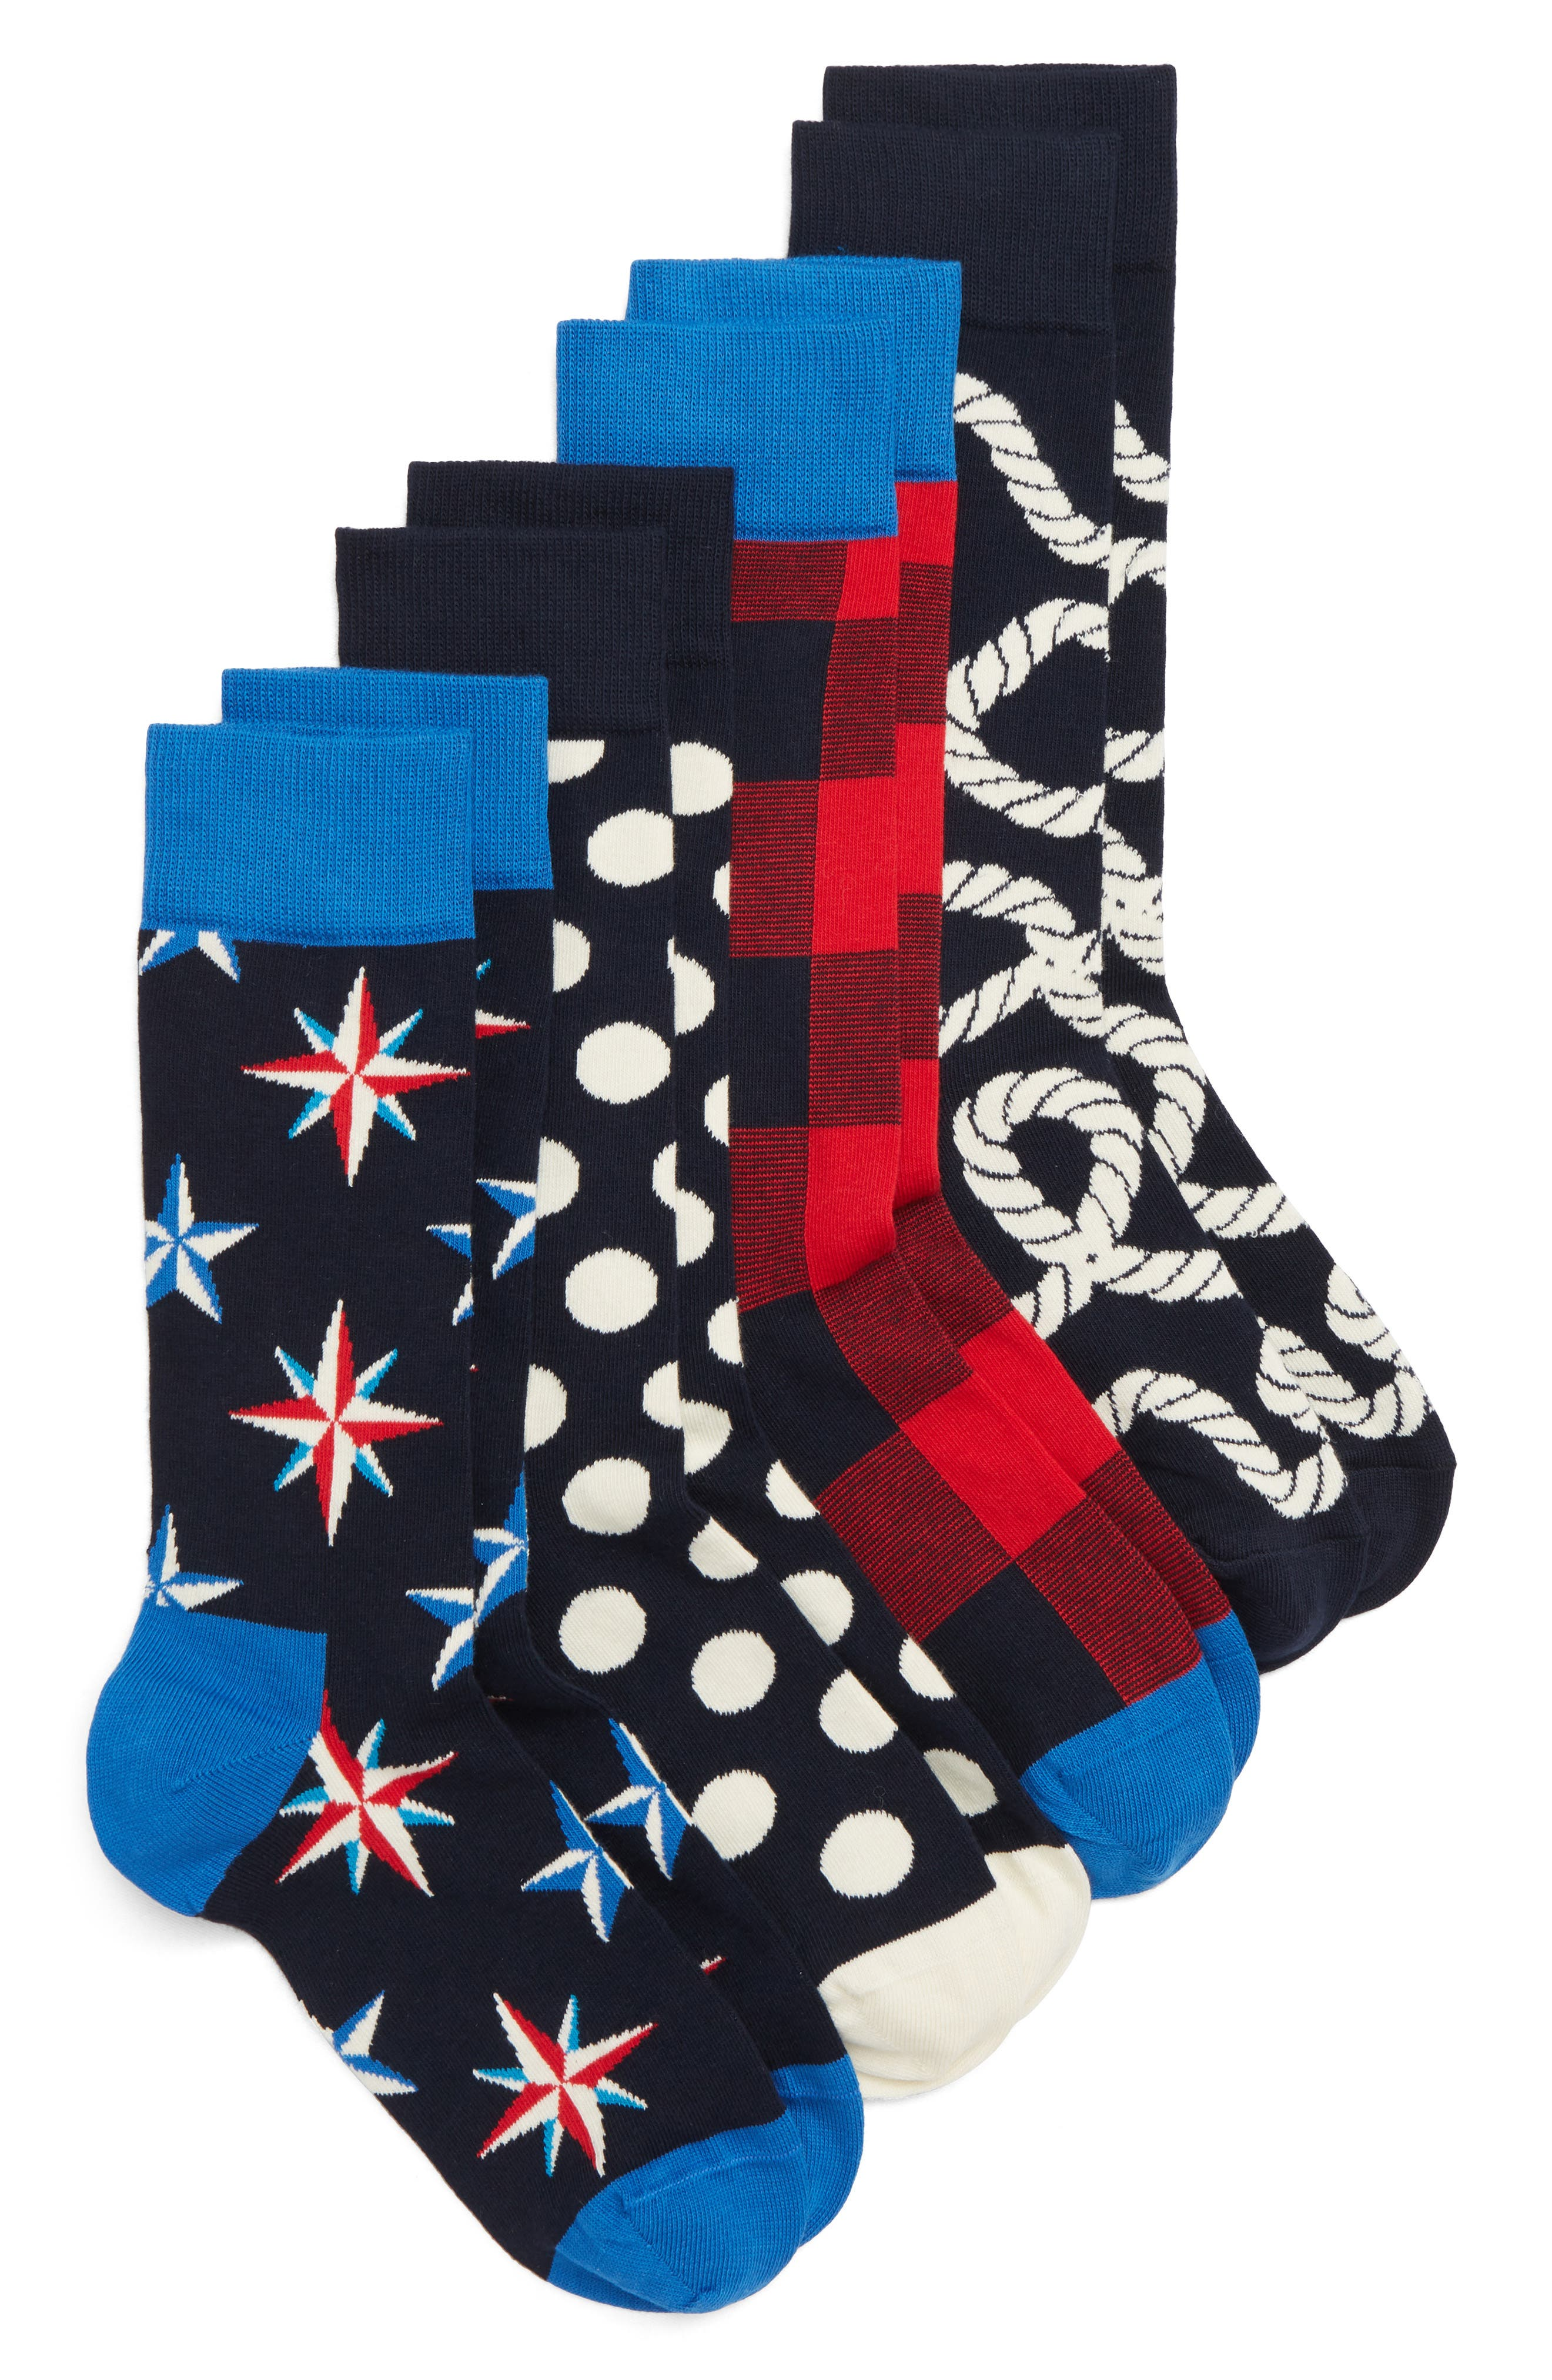 Nautical 4-Pack Box Set Socks,                             Main thumbnail 1, color,                             NAVY/ RED/ WHITE